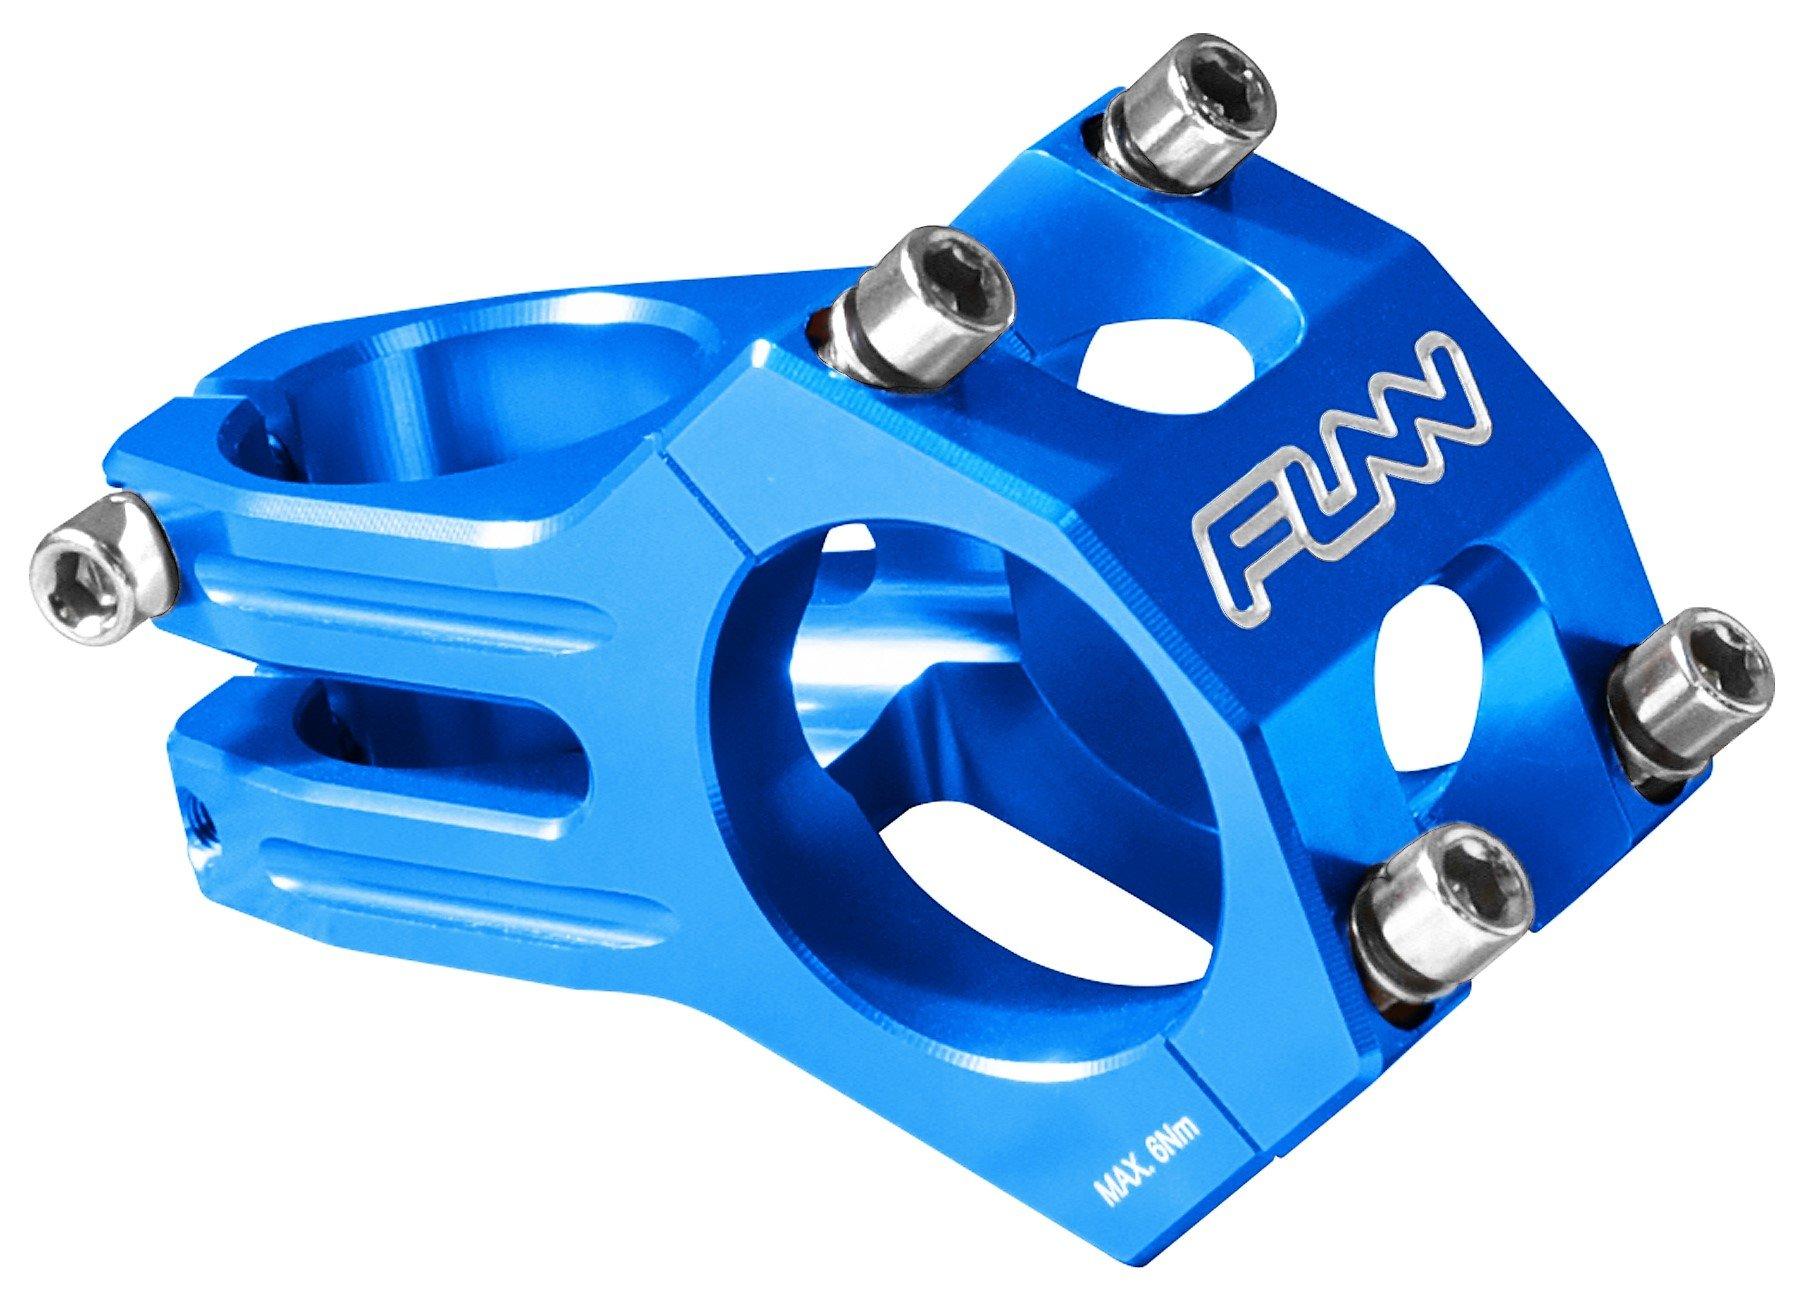 Funn Funnduro MTB Stem, Bar Clamp 31.8mm (Length 60mm, Blue) by Funn